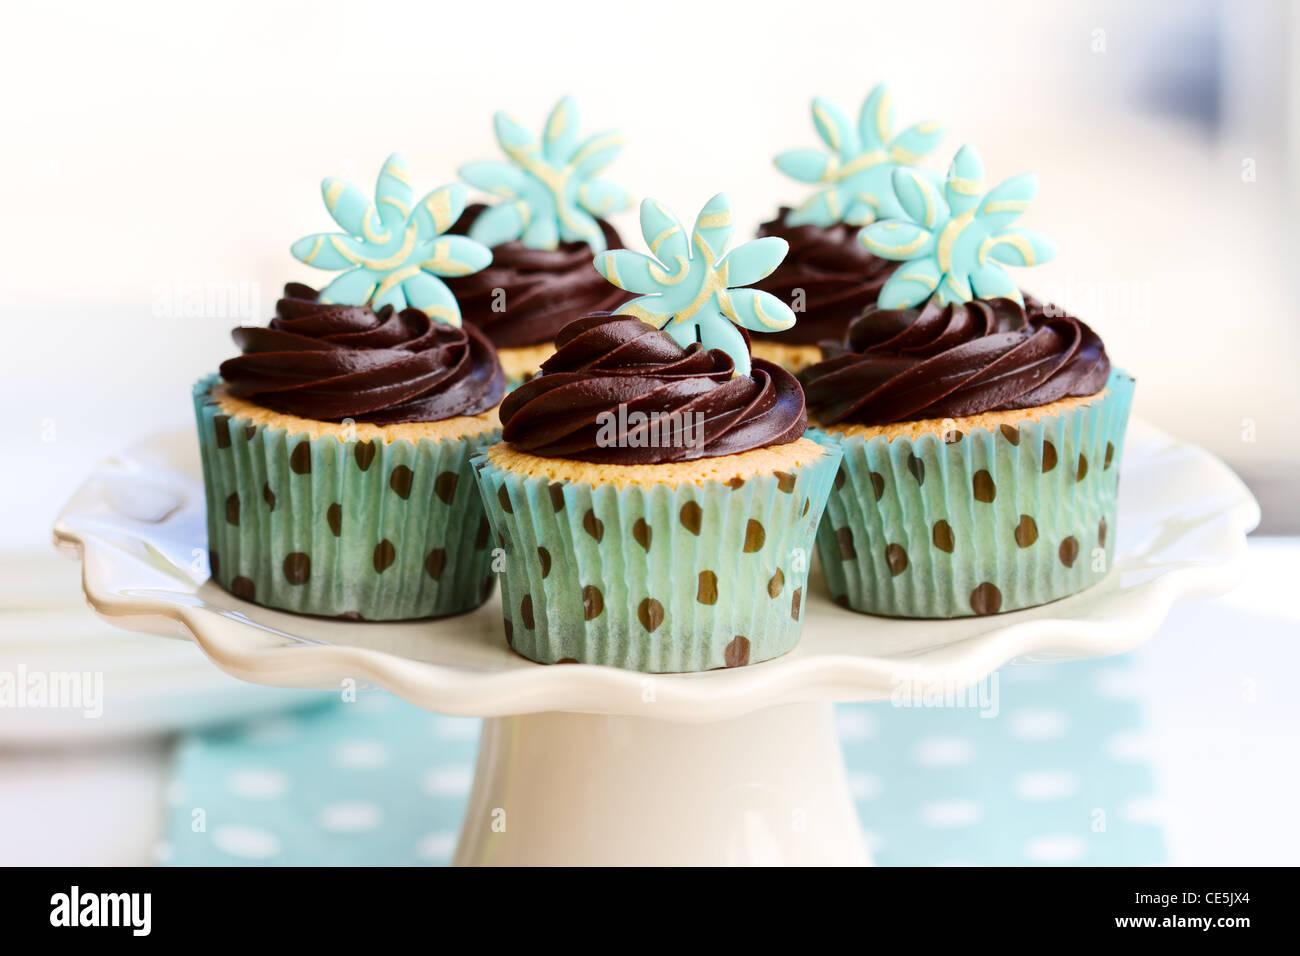 Pastelitos de chocolate Imagen De Stock